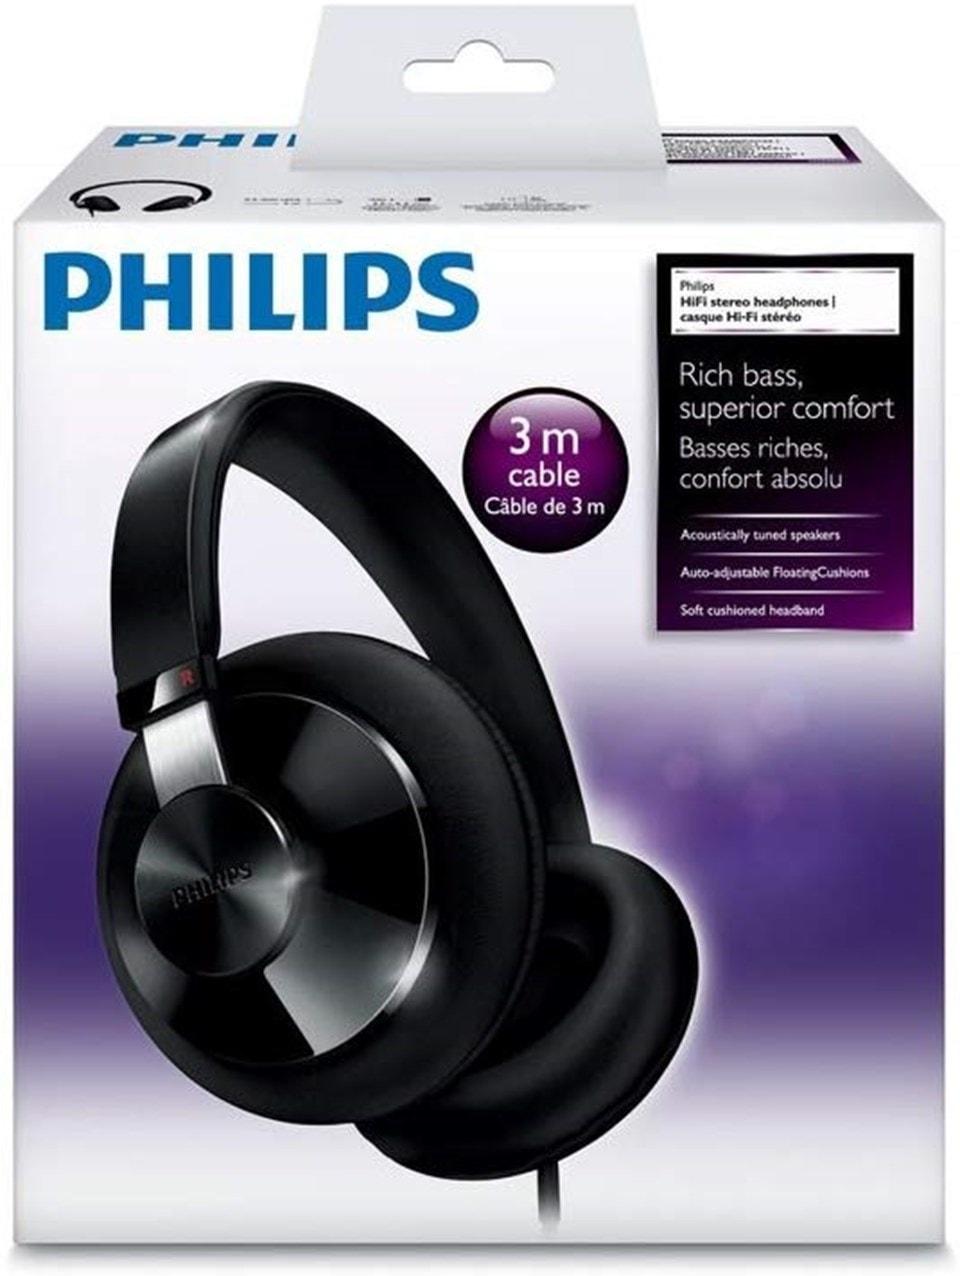 Philips SHP6000 Black Headphones - 4